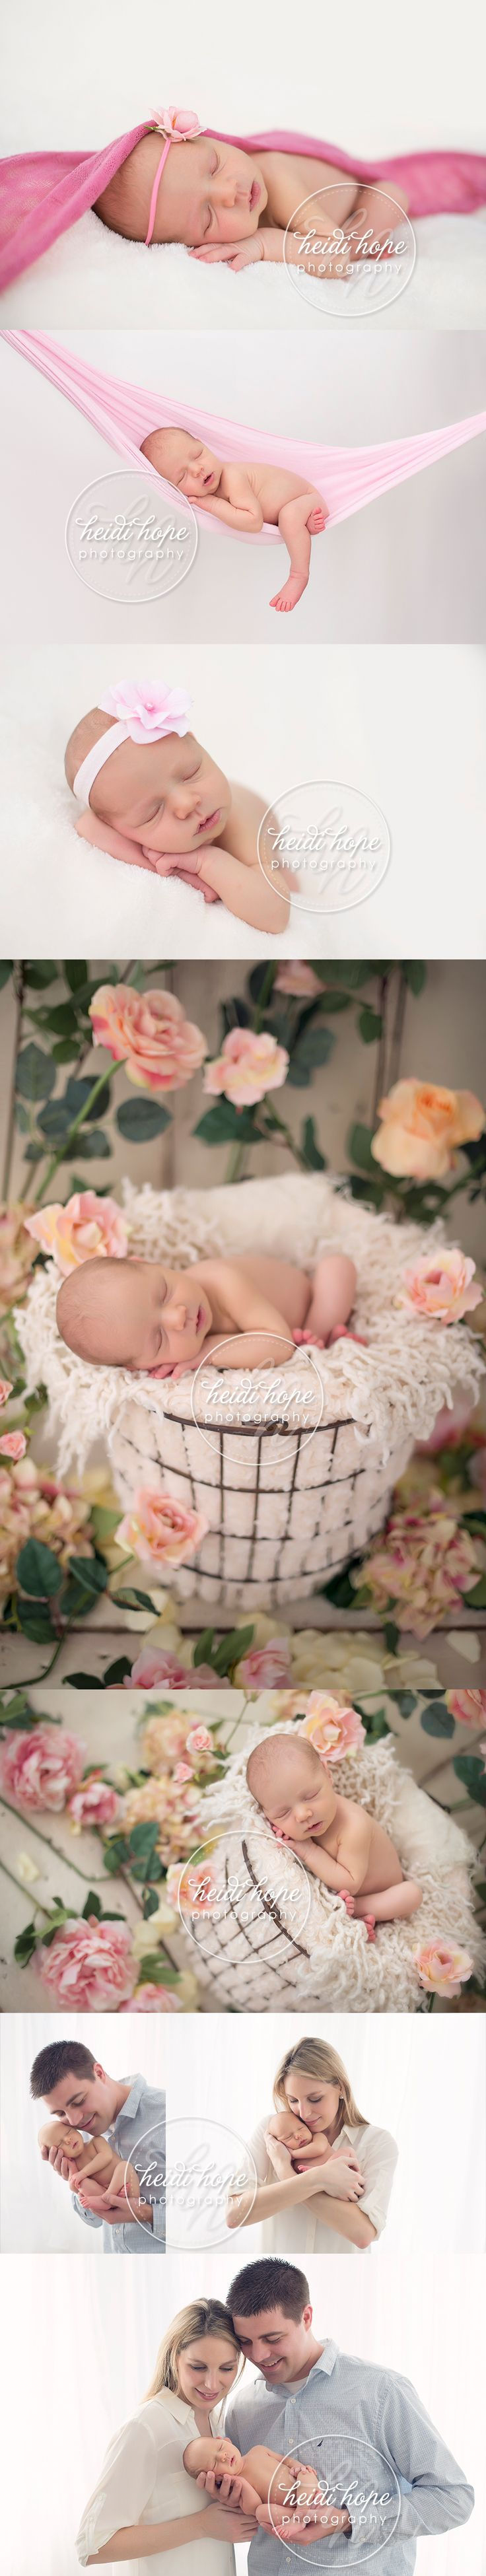 Newborn baby V among the flowers in a Massachusetts family newborn portrait session!